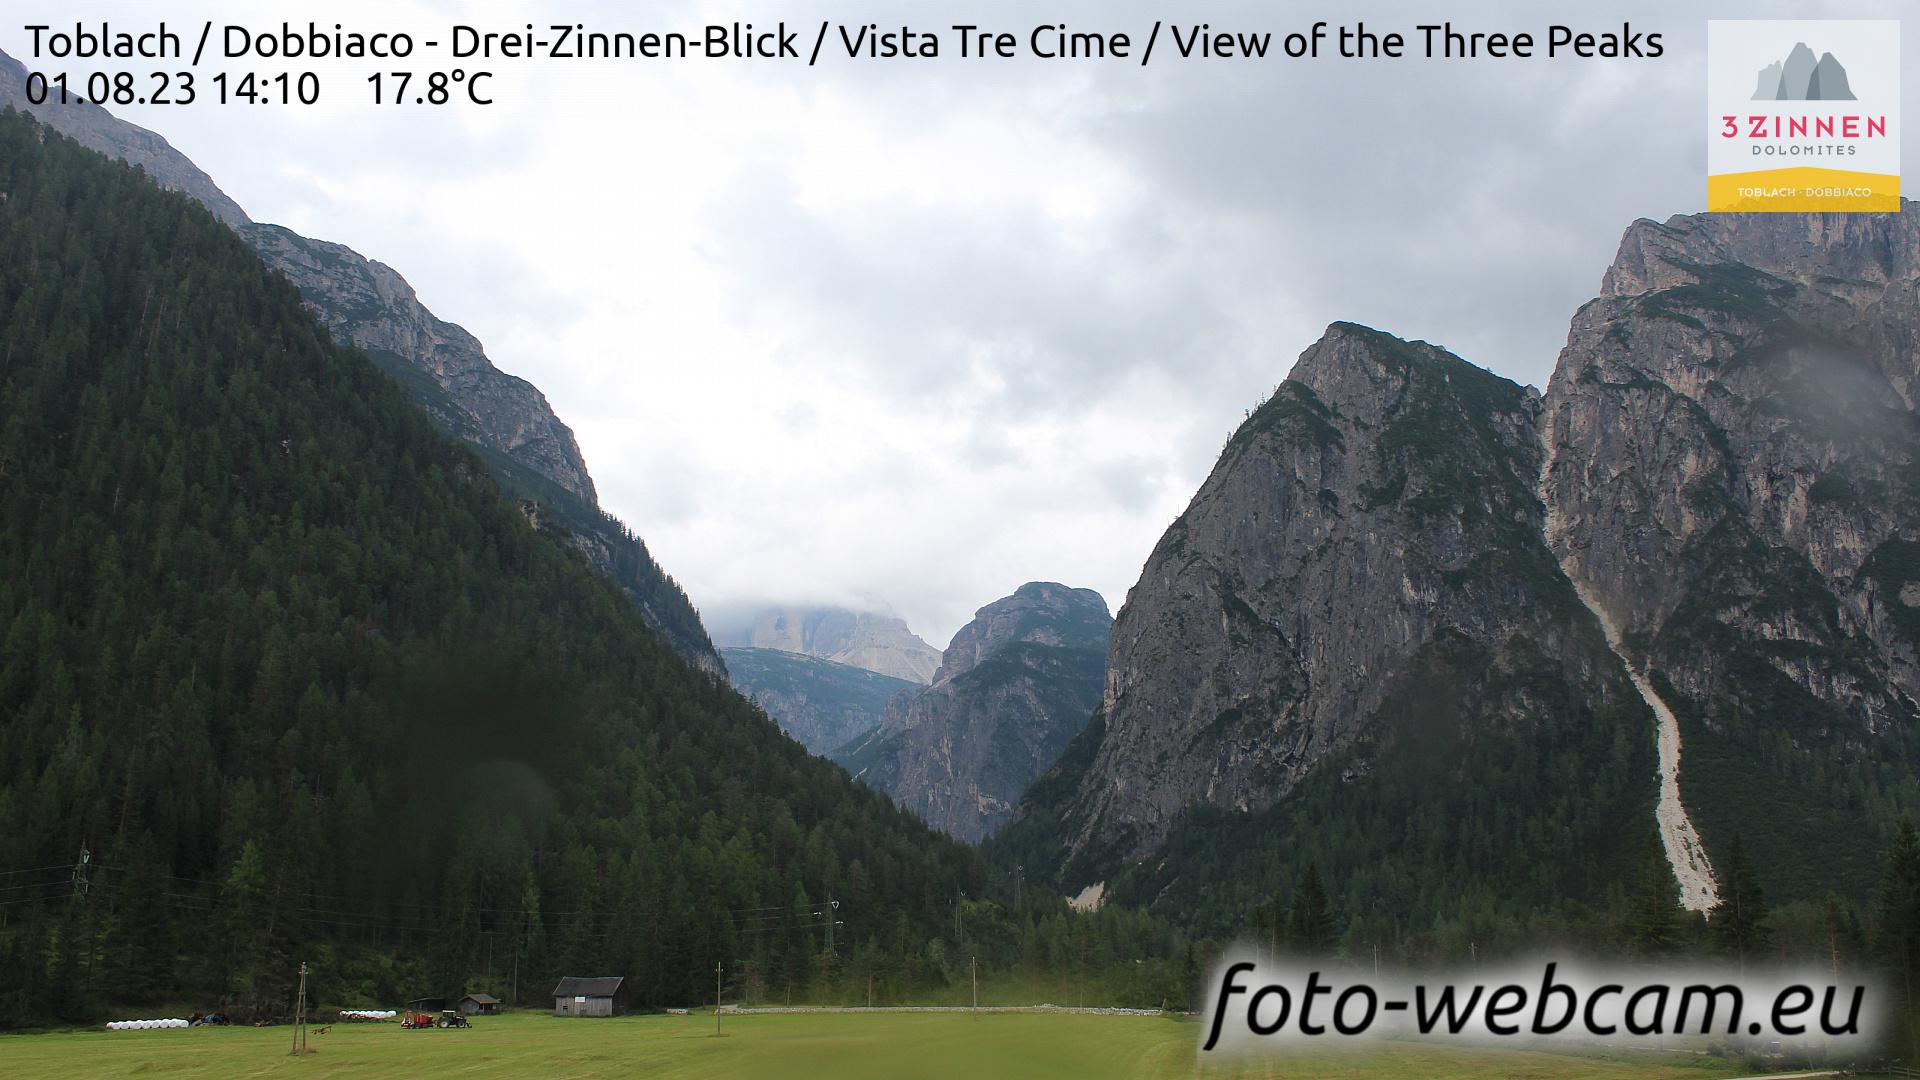 Toblach (Dolomiten) Do. 14:27